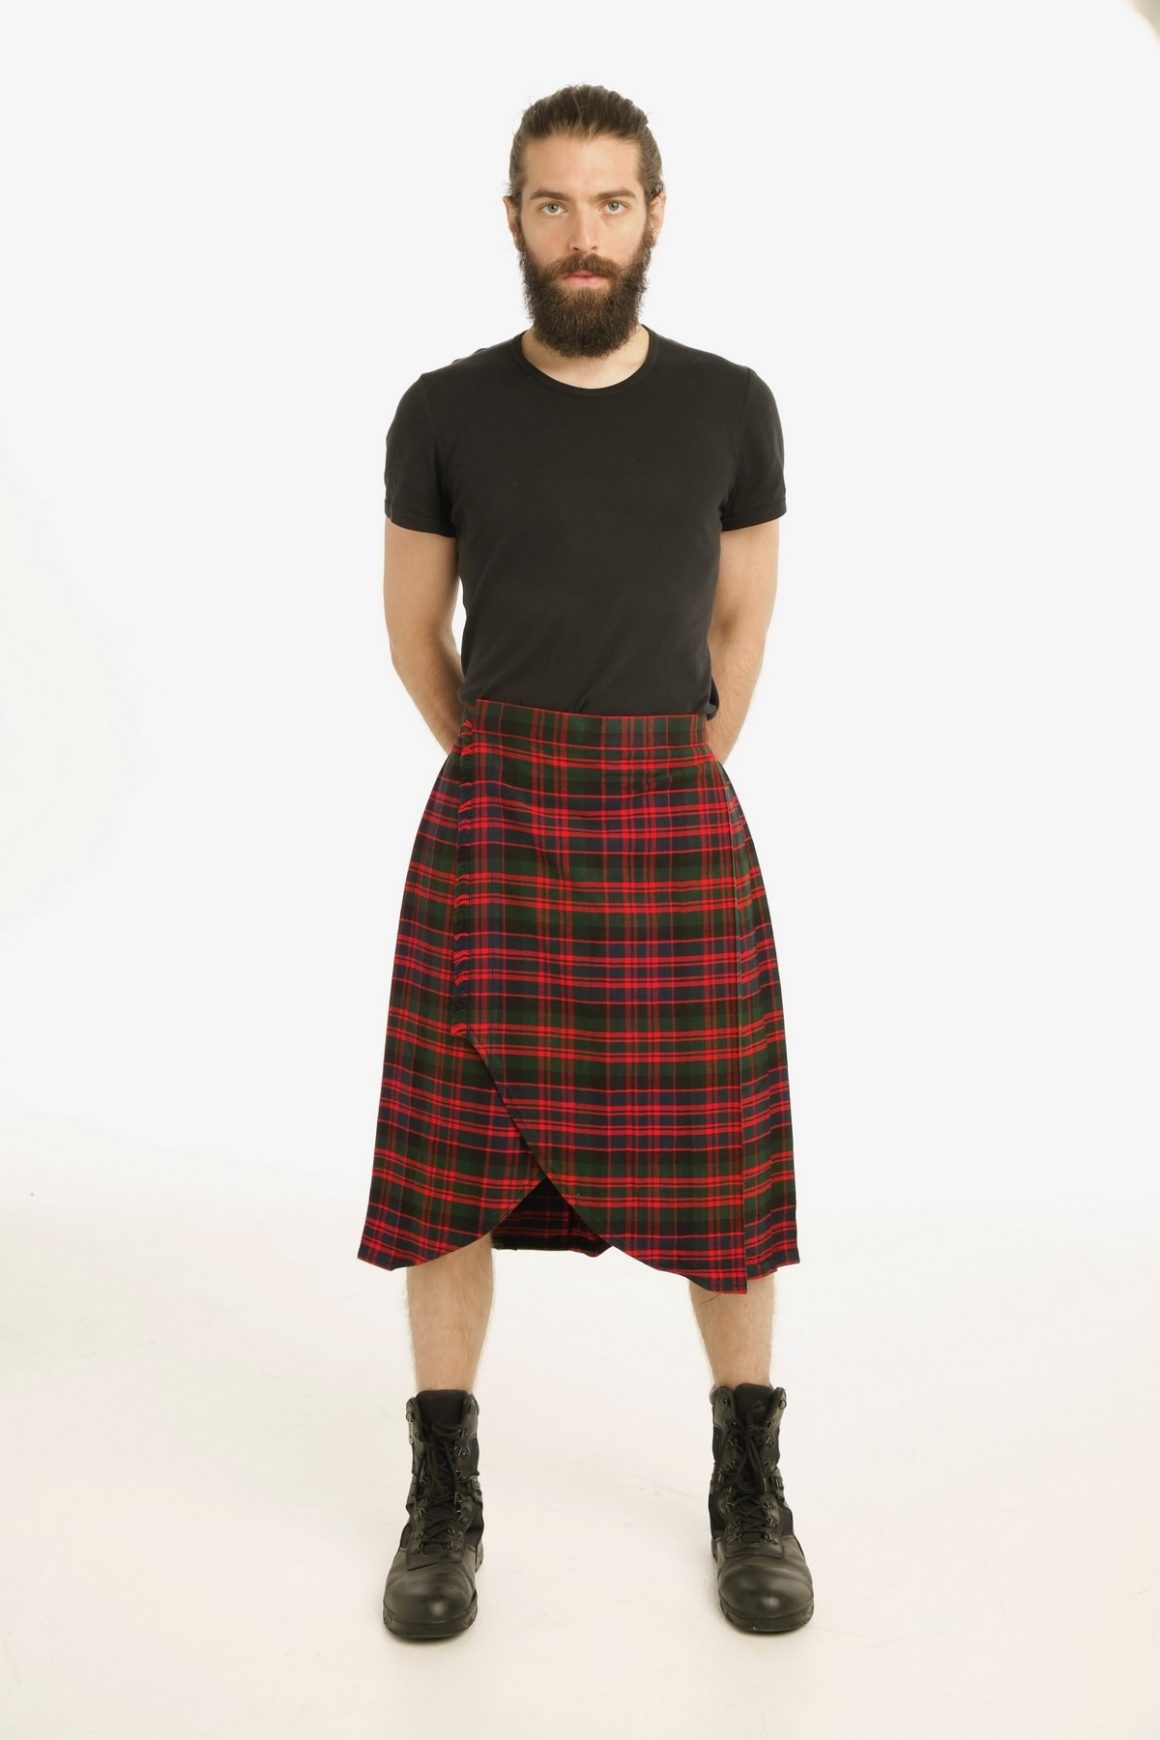 Tartan Kilt For Stylish Men